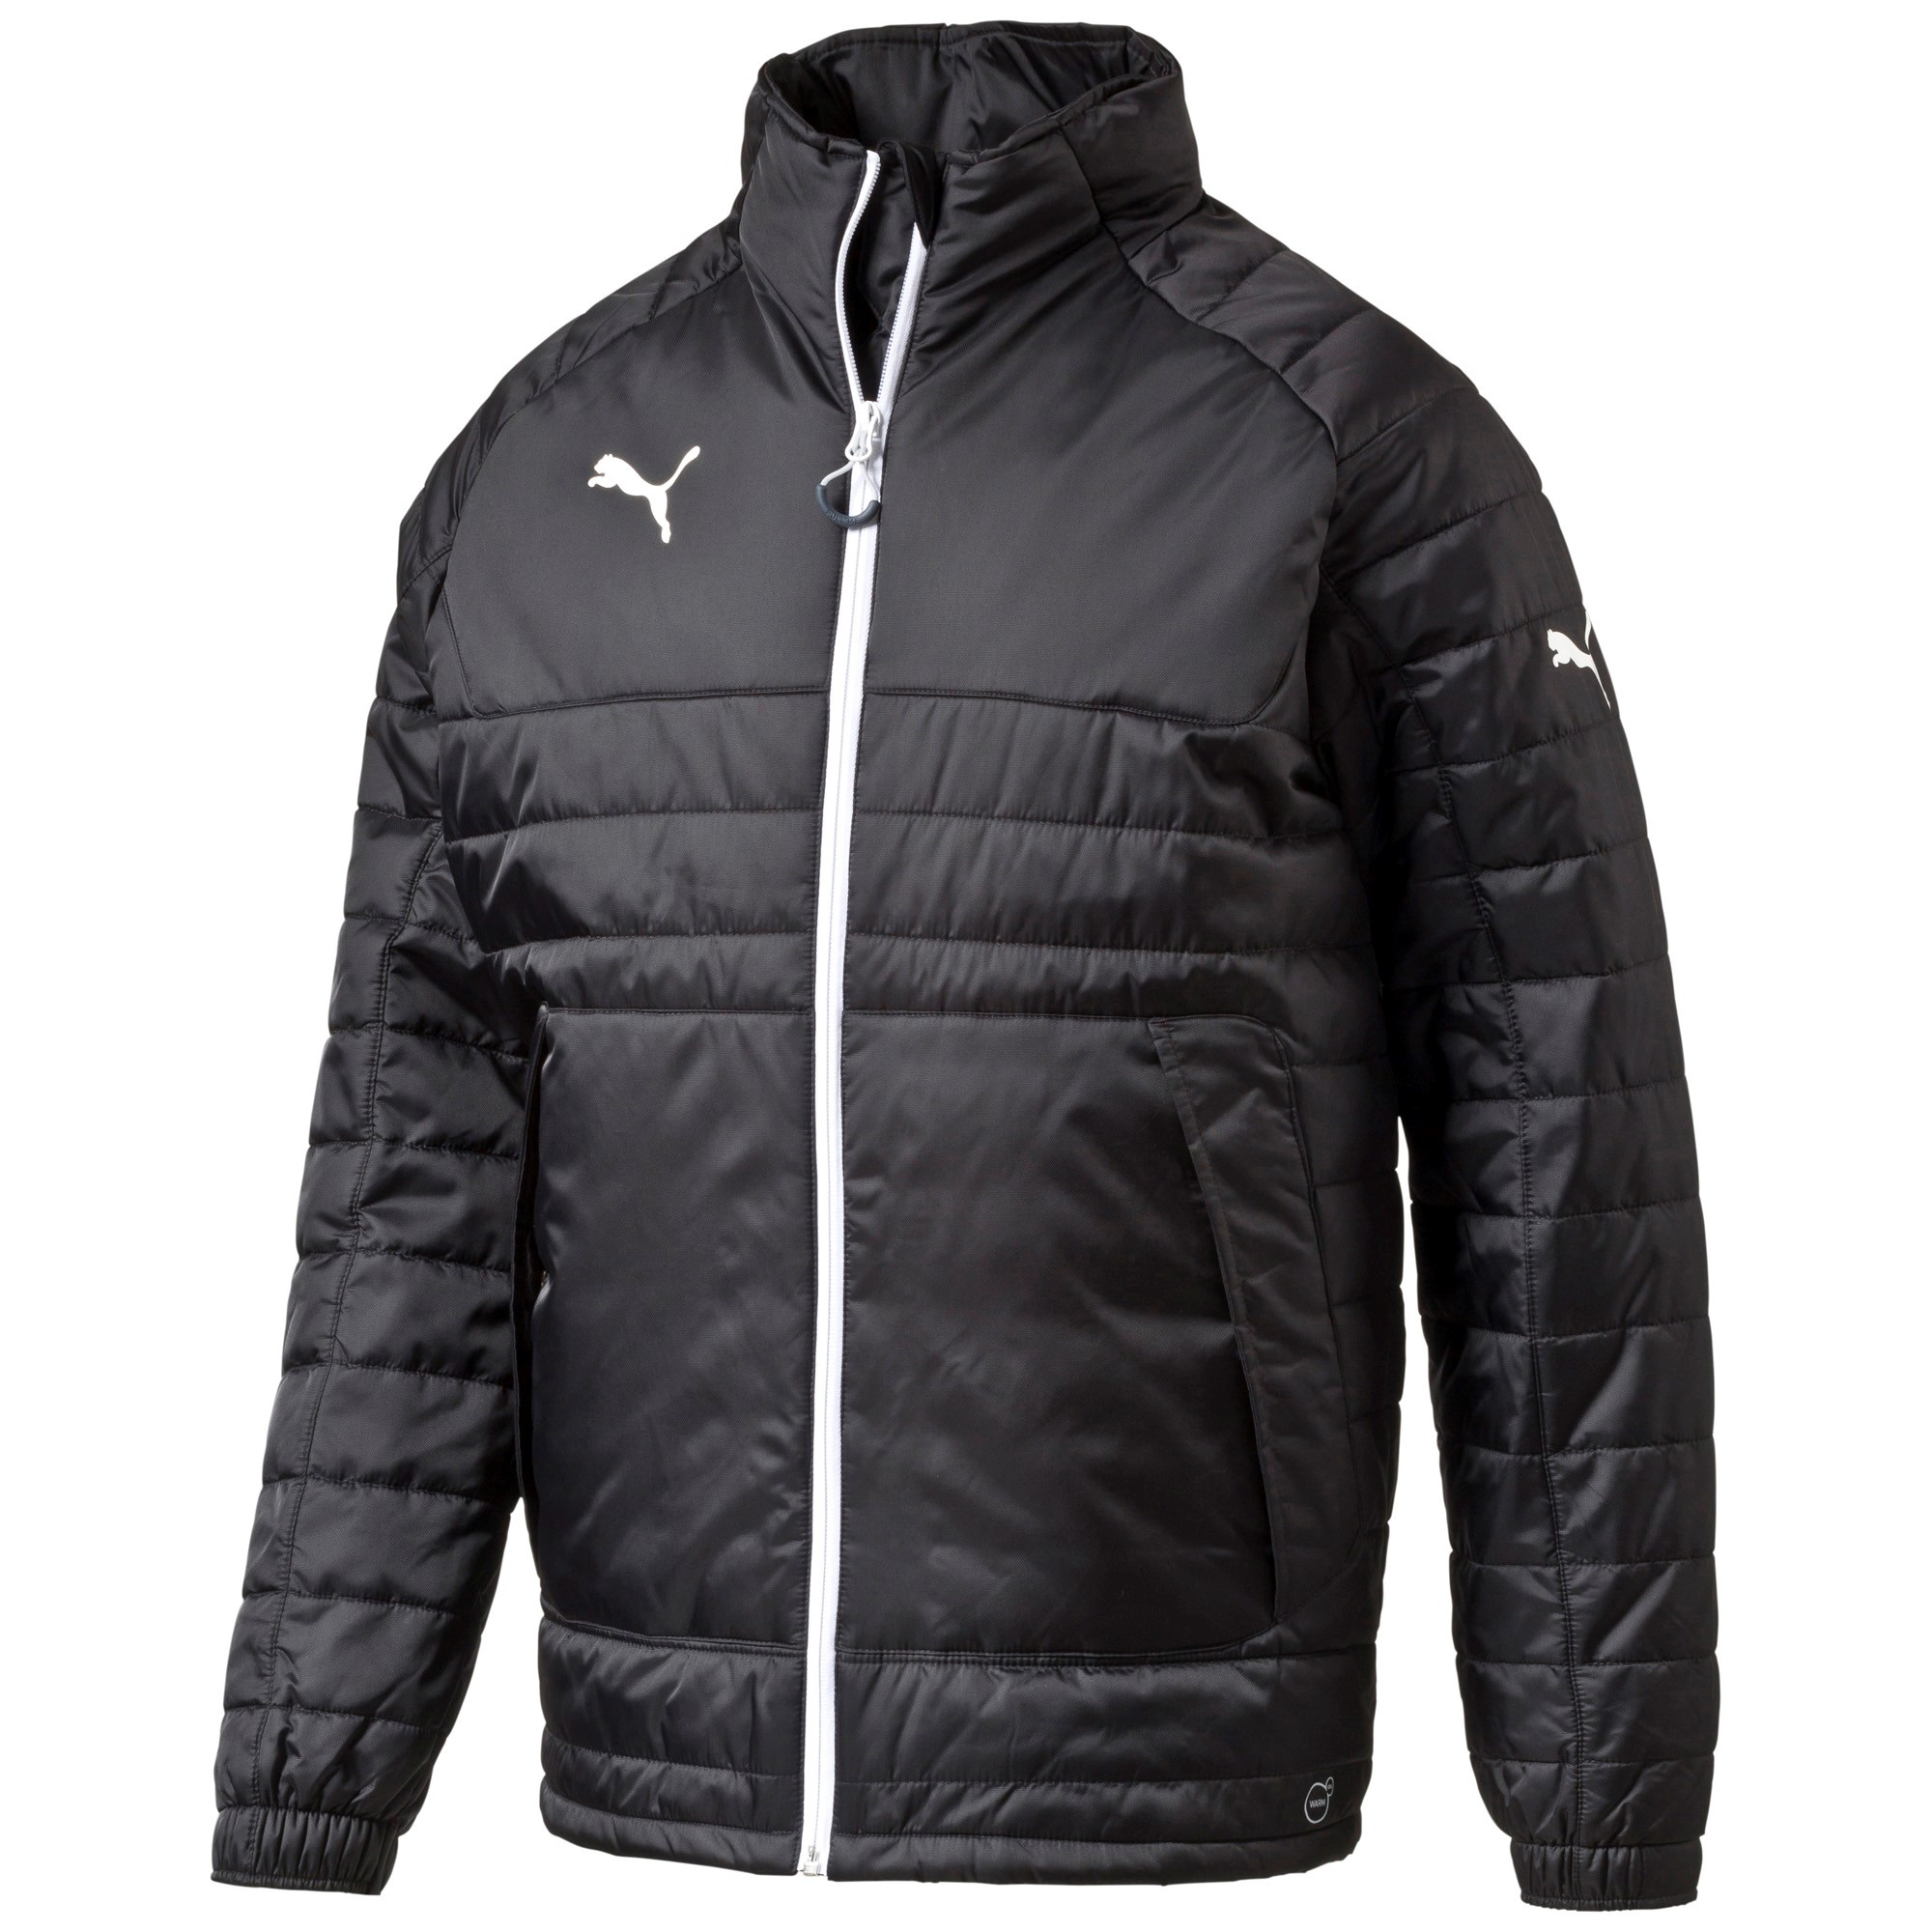 Veste d'hiver black (prix adultes/ juniors)